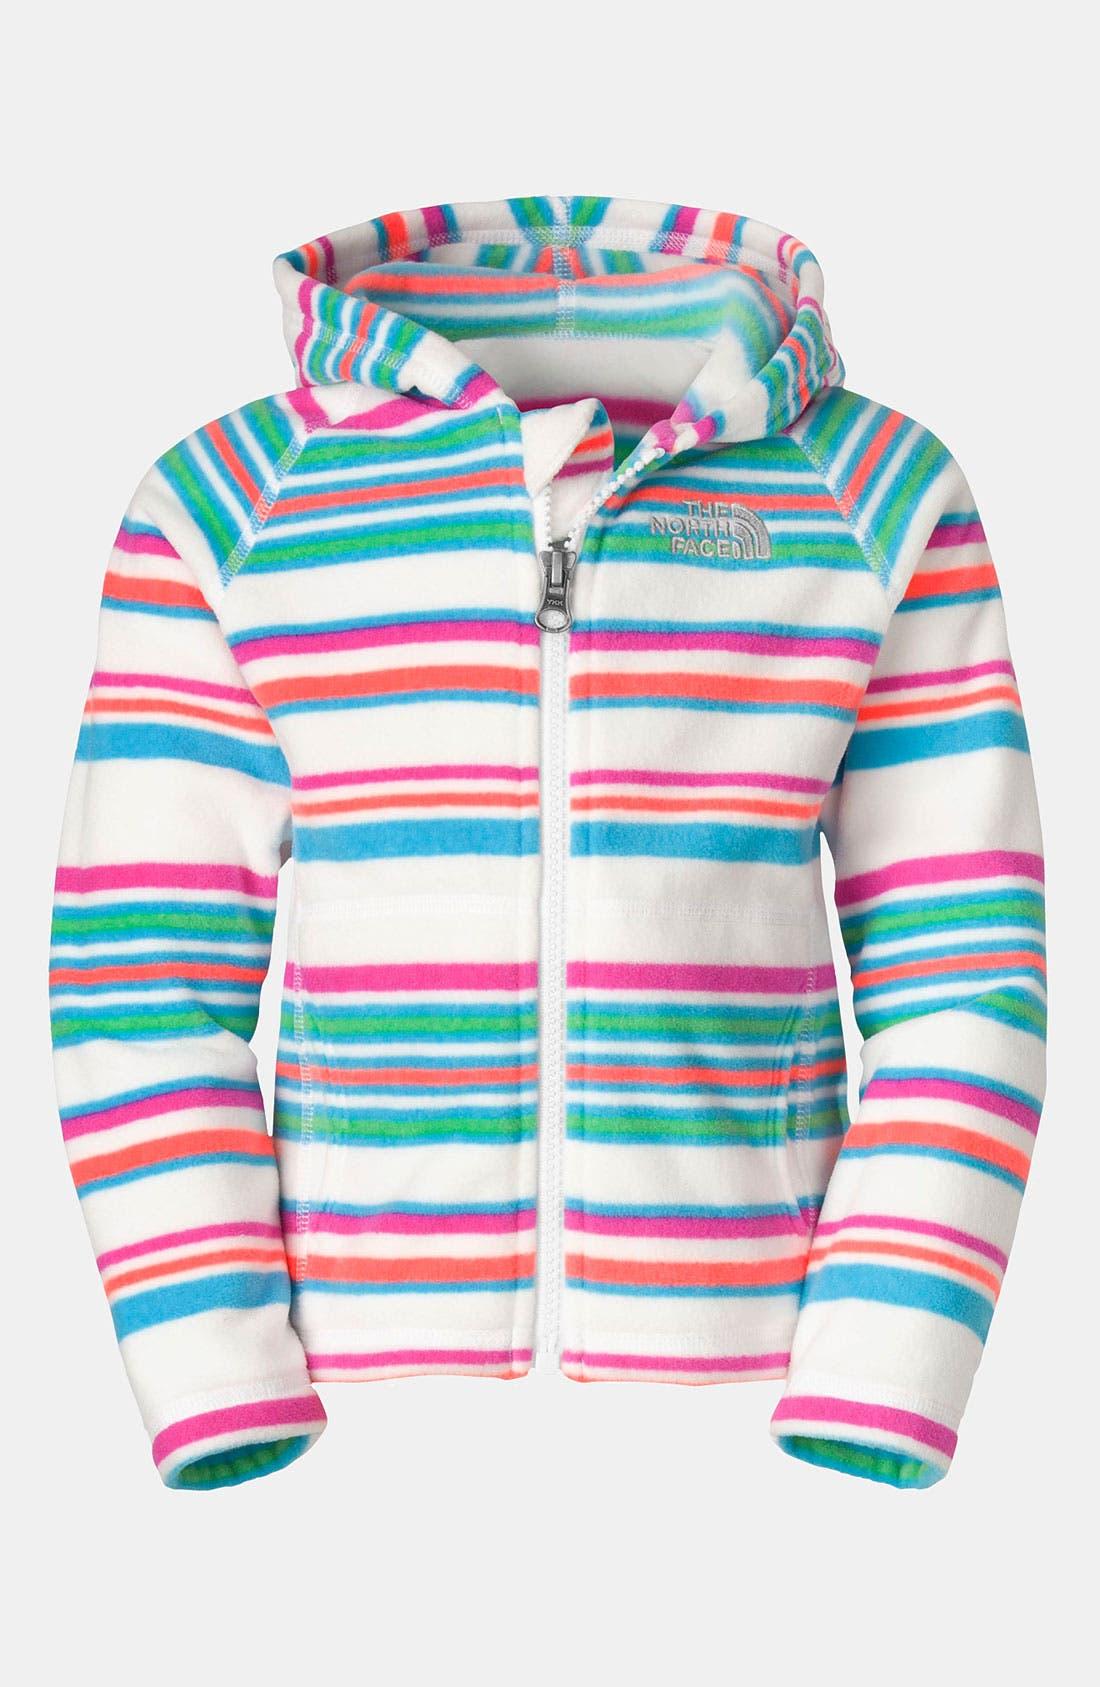 Alternate Image 1 Selected - The North Face 'Glacier' Fleece Jacket (Toddler)